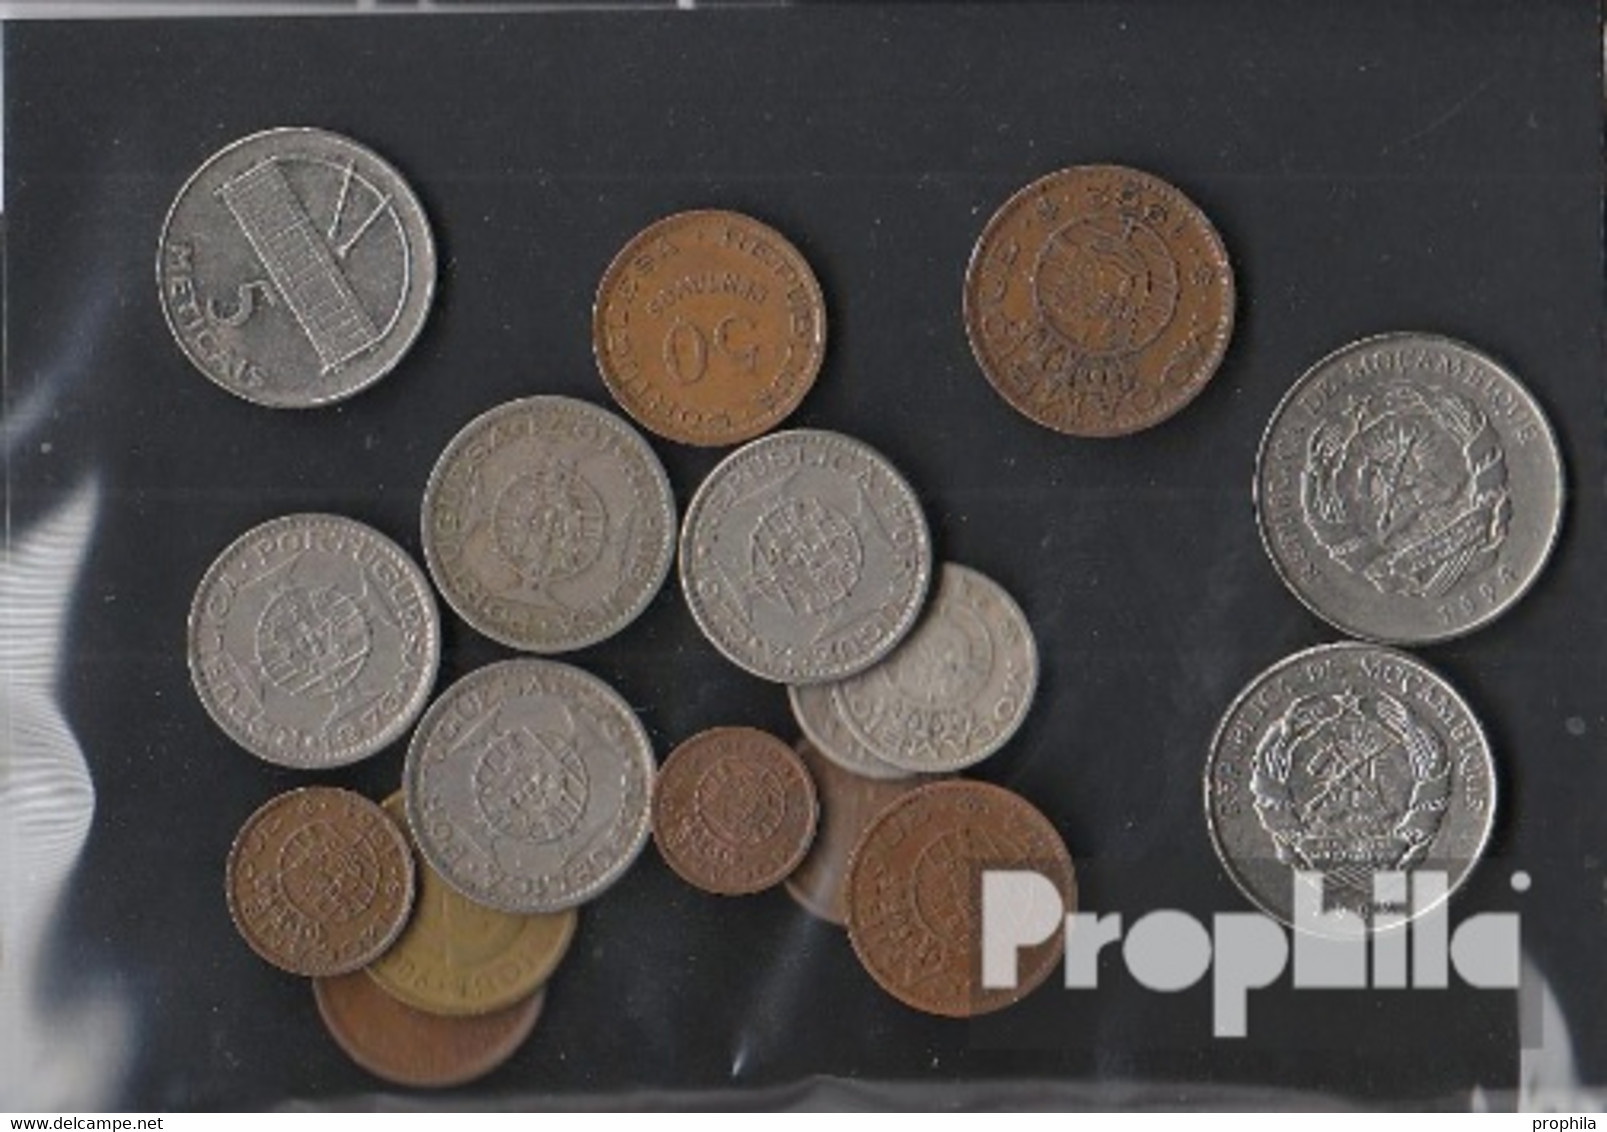 Mosambik 100 Gramm Münzkiloware - Munten & Bankbiljetten